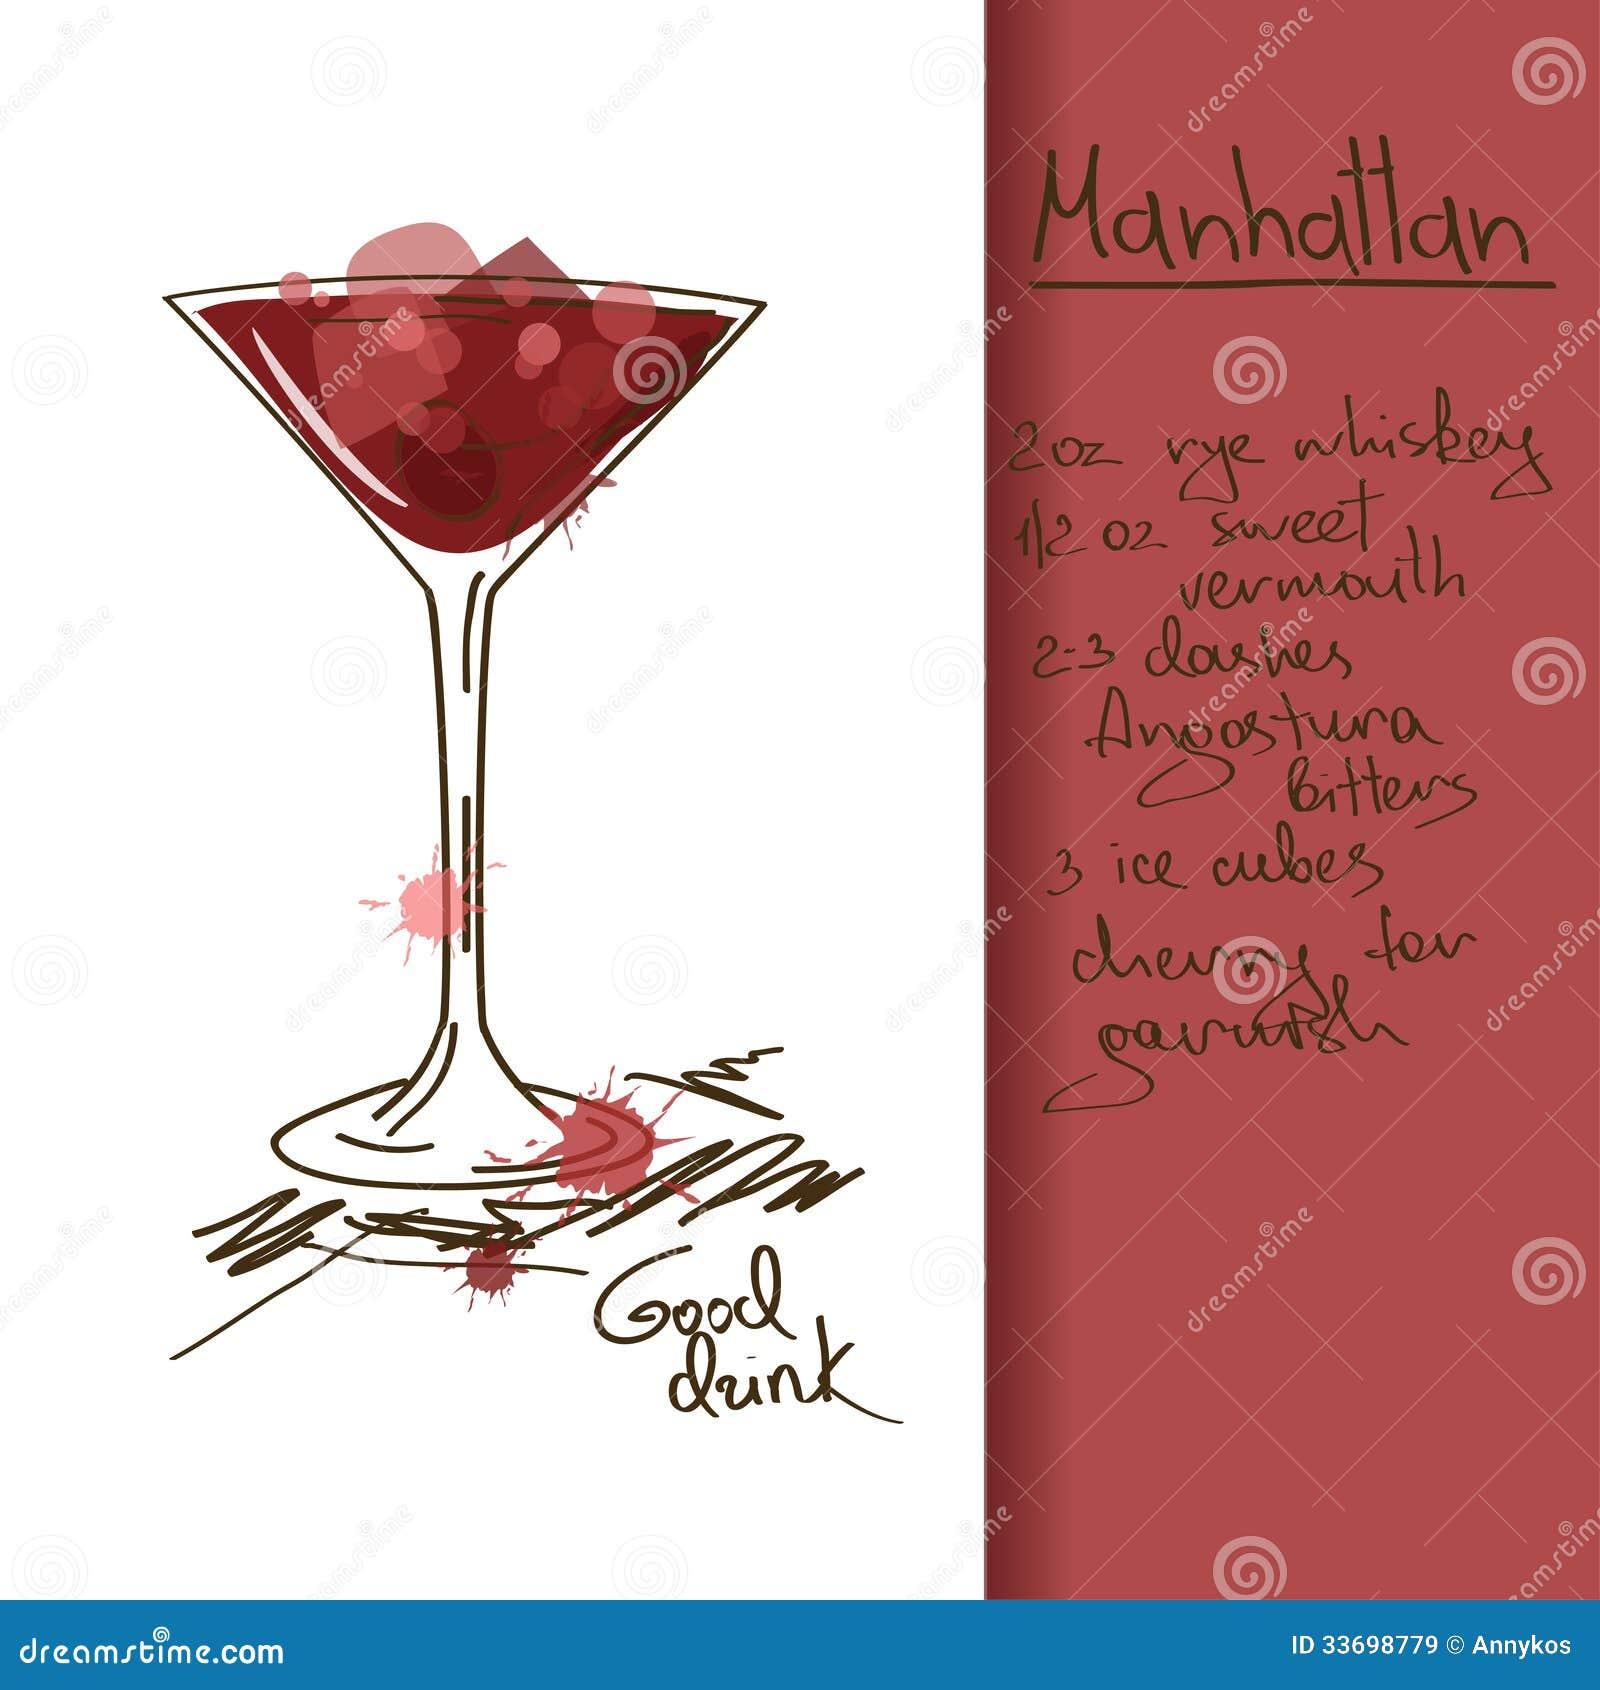 Manhattan Cocktail Stock Illustrations 699 Manhattan Cocktail Stock Illustrations Vectors Clipart Dreamstime